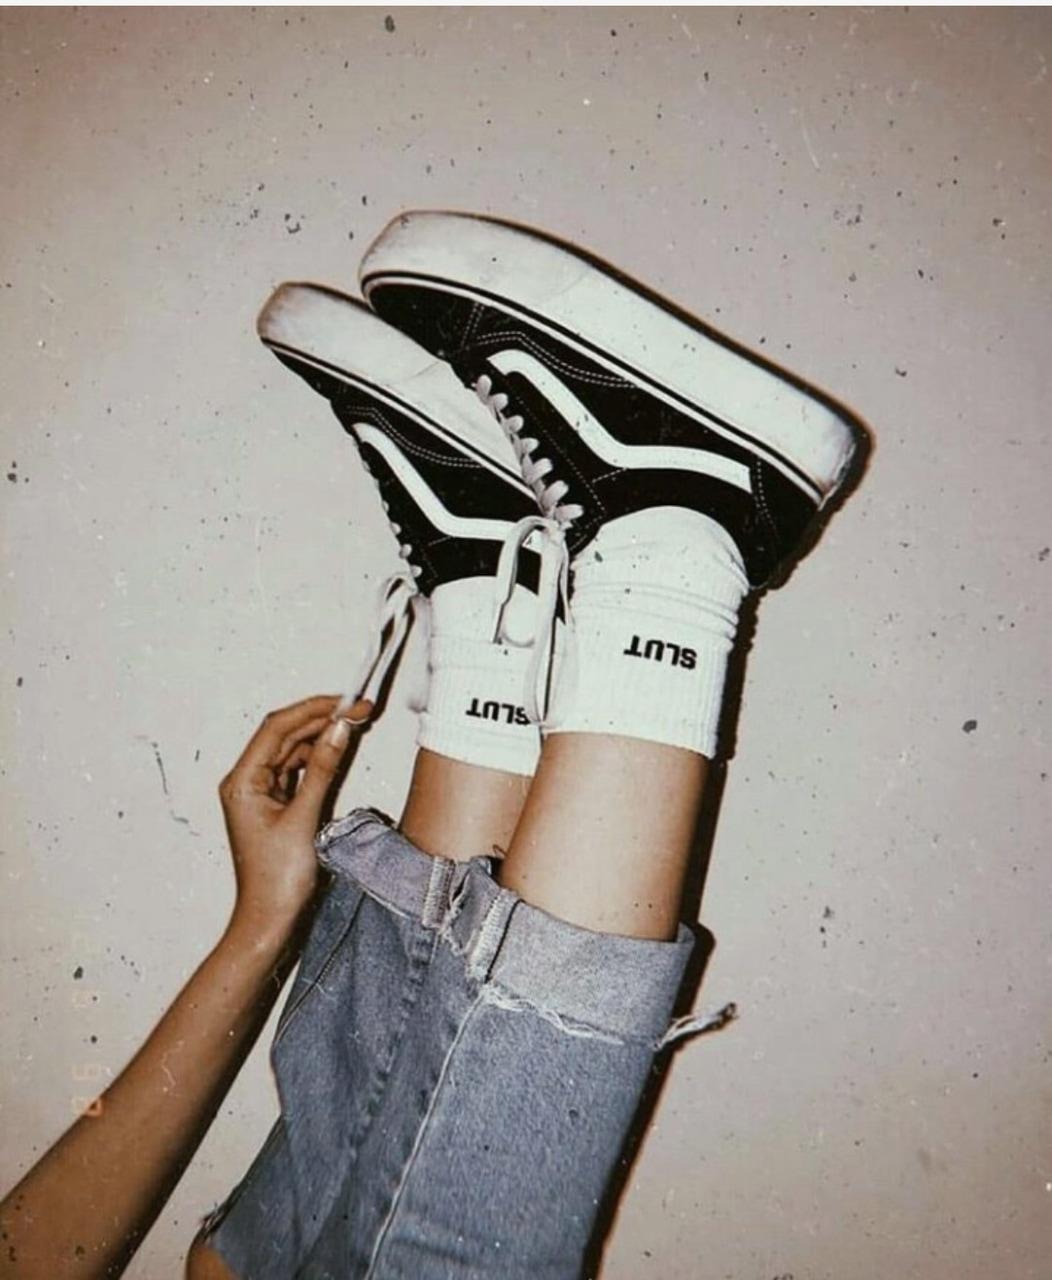 vans, jeans, and socks image